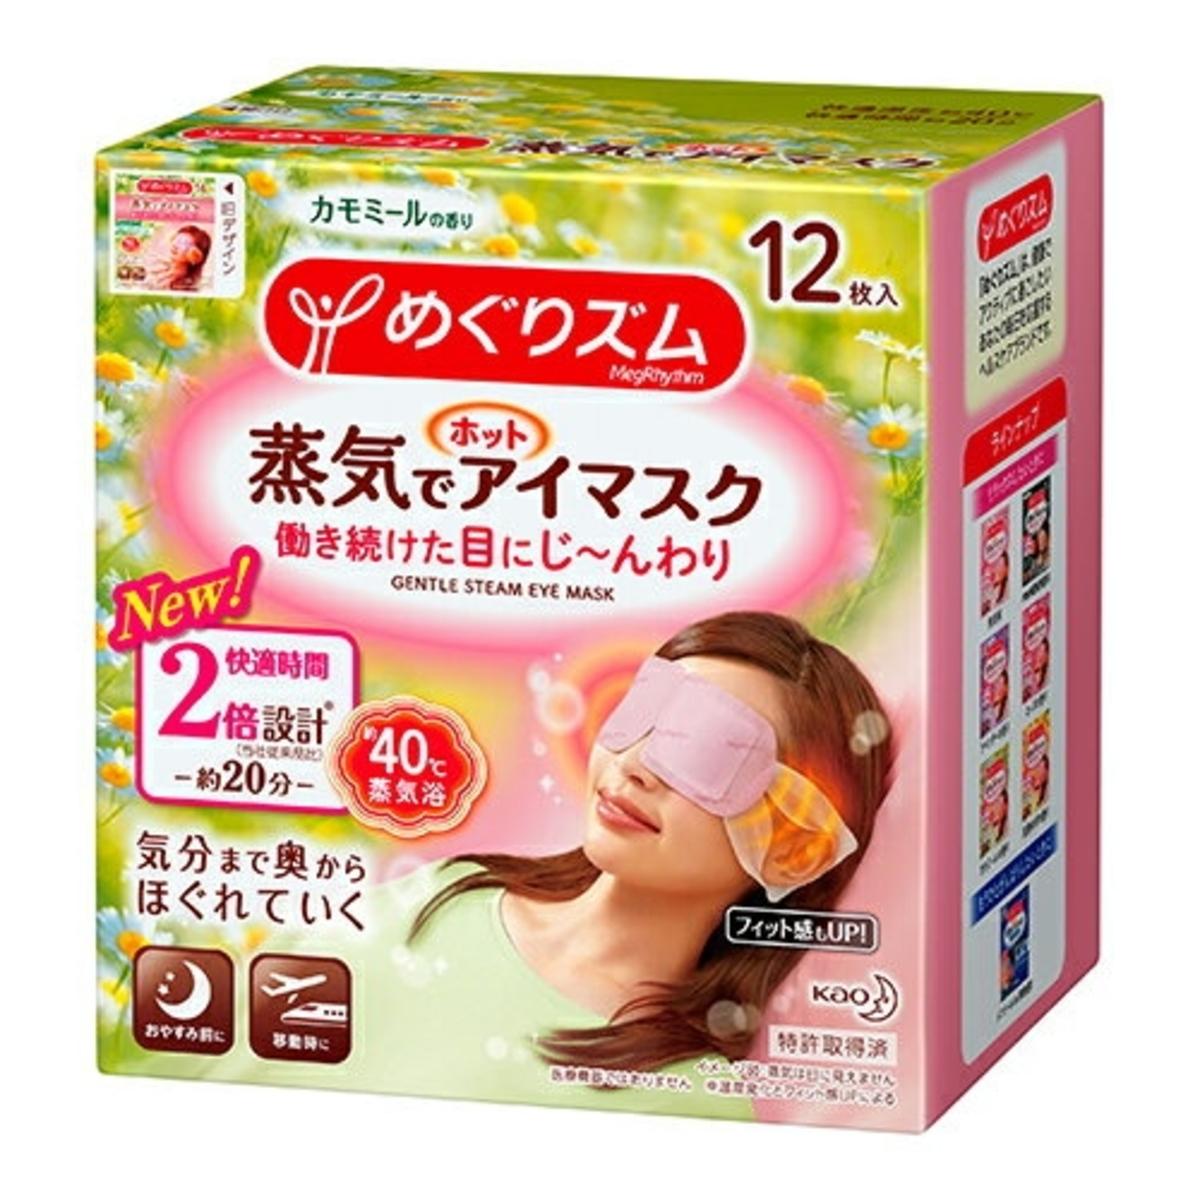 Ginger Aroma (Chamomile) Steam Eye Mask -  12pcs/Box (4901301348067)